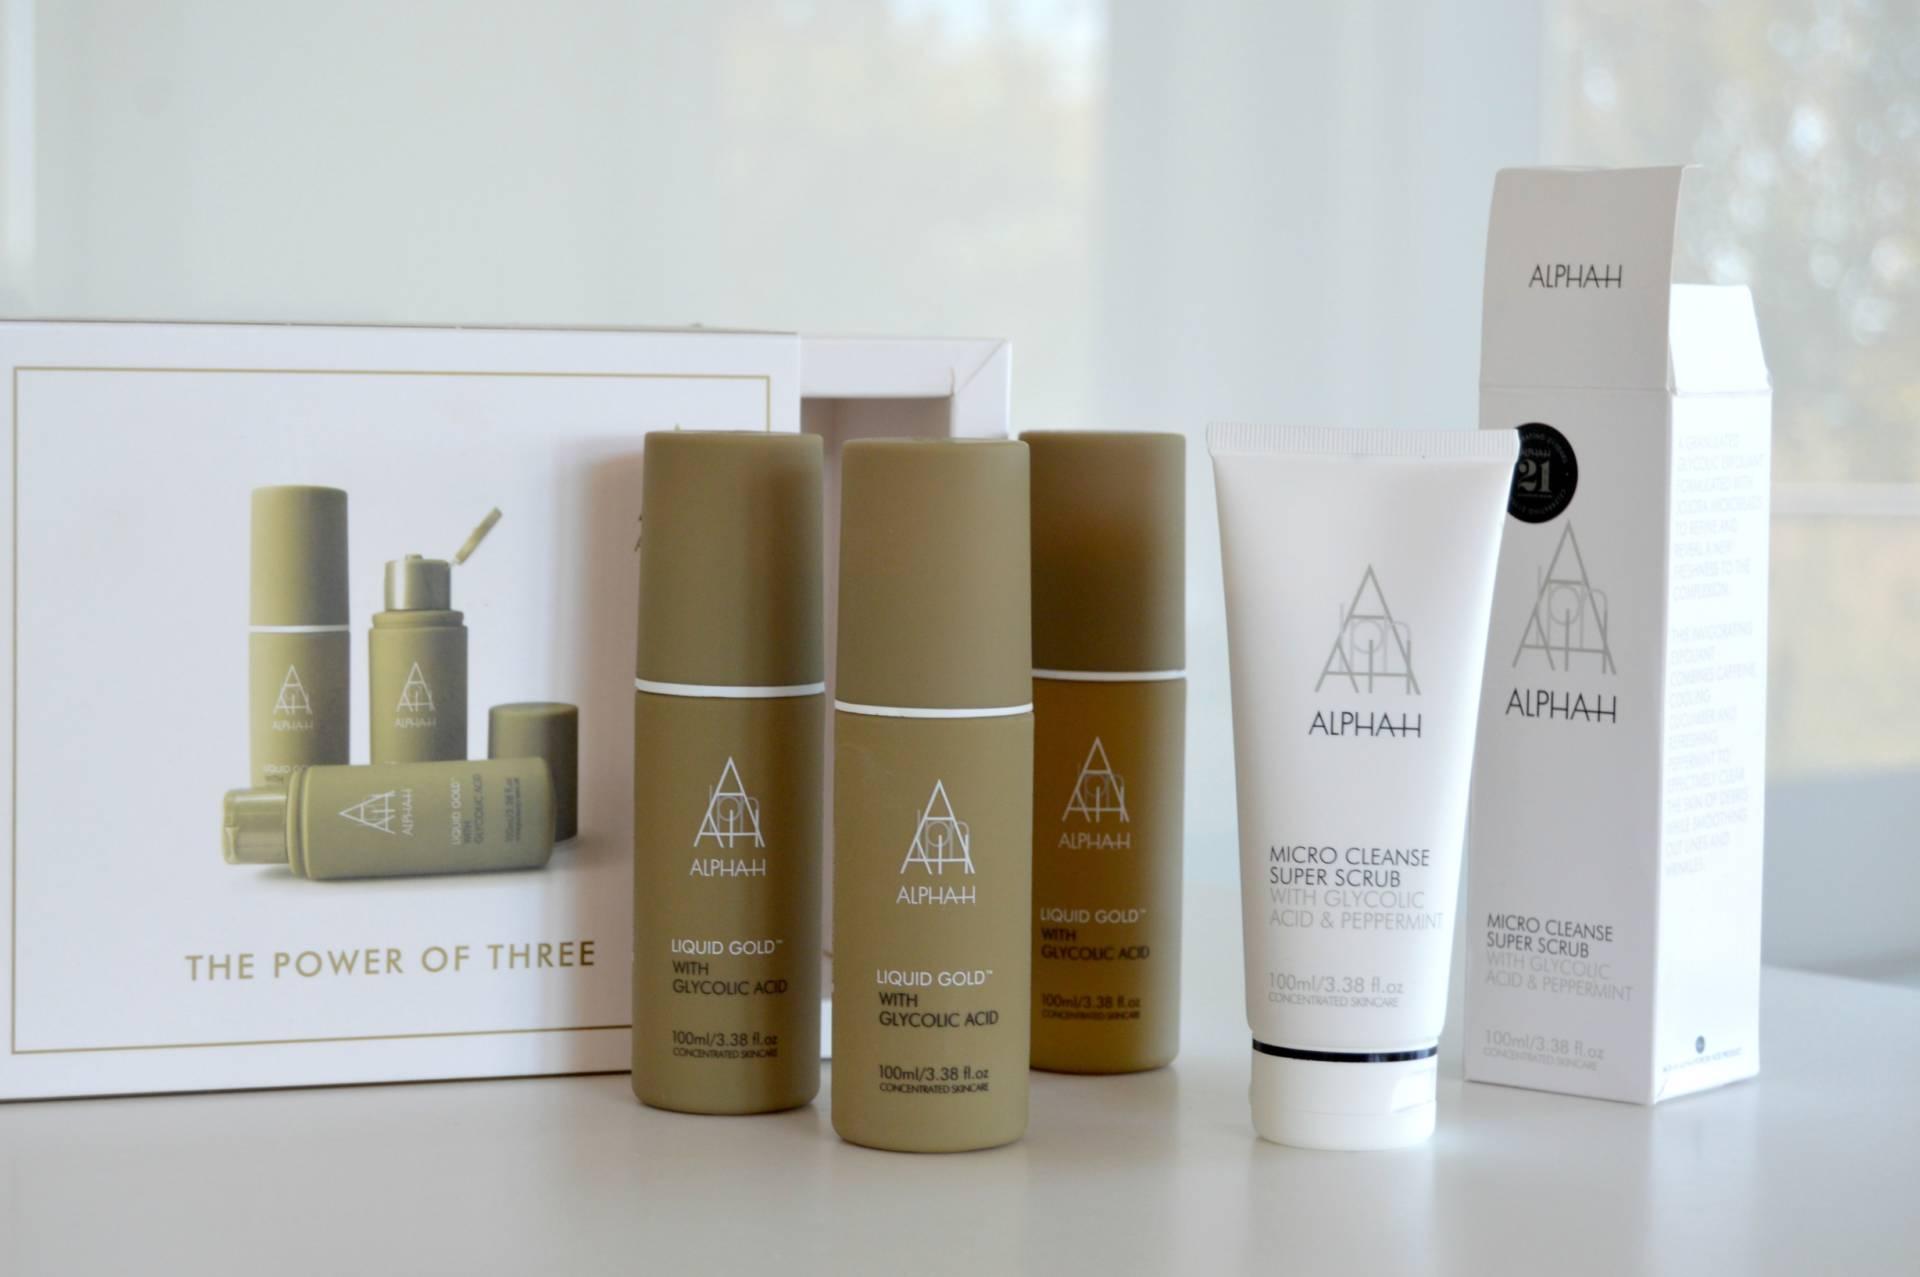 alpha-h-liquid-gold-trio-travel-shopping-qvc-london-inhautepursuit-review